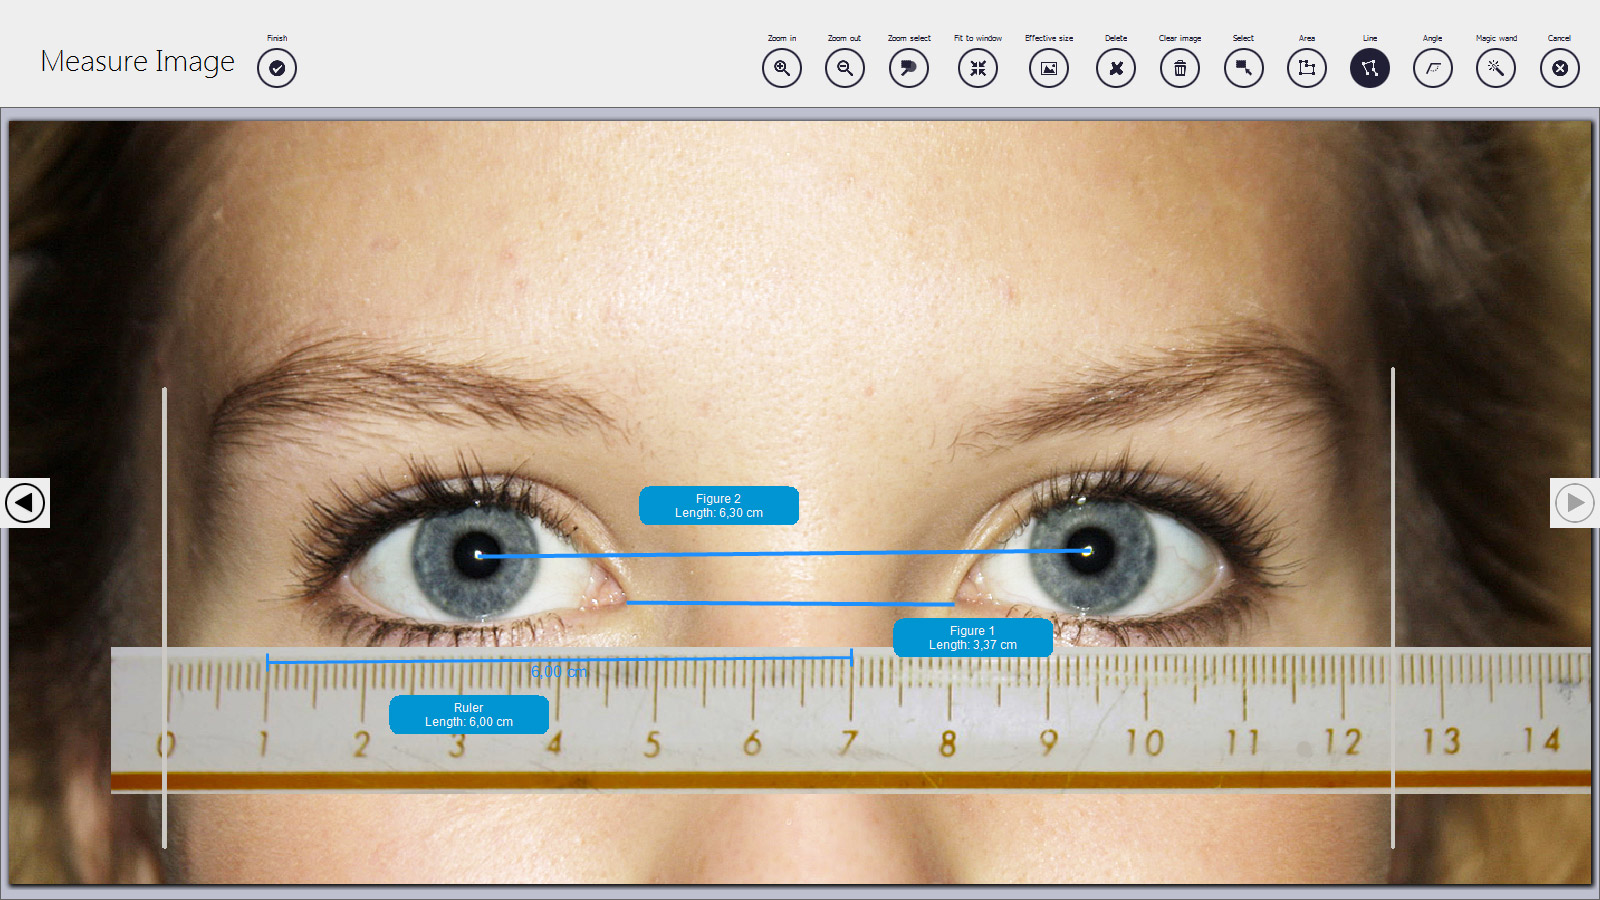 klonk image measurement free software tool image